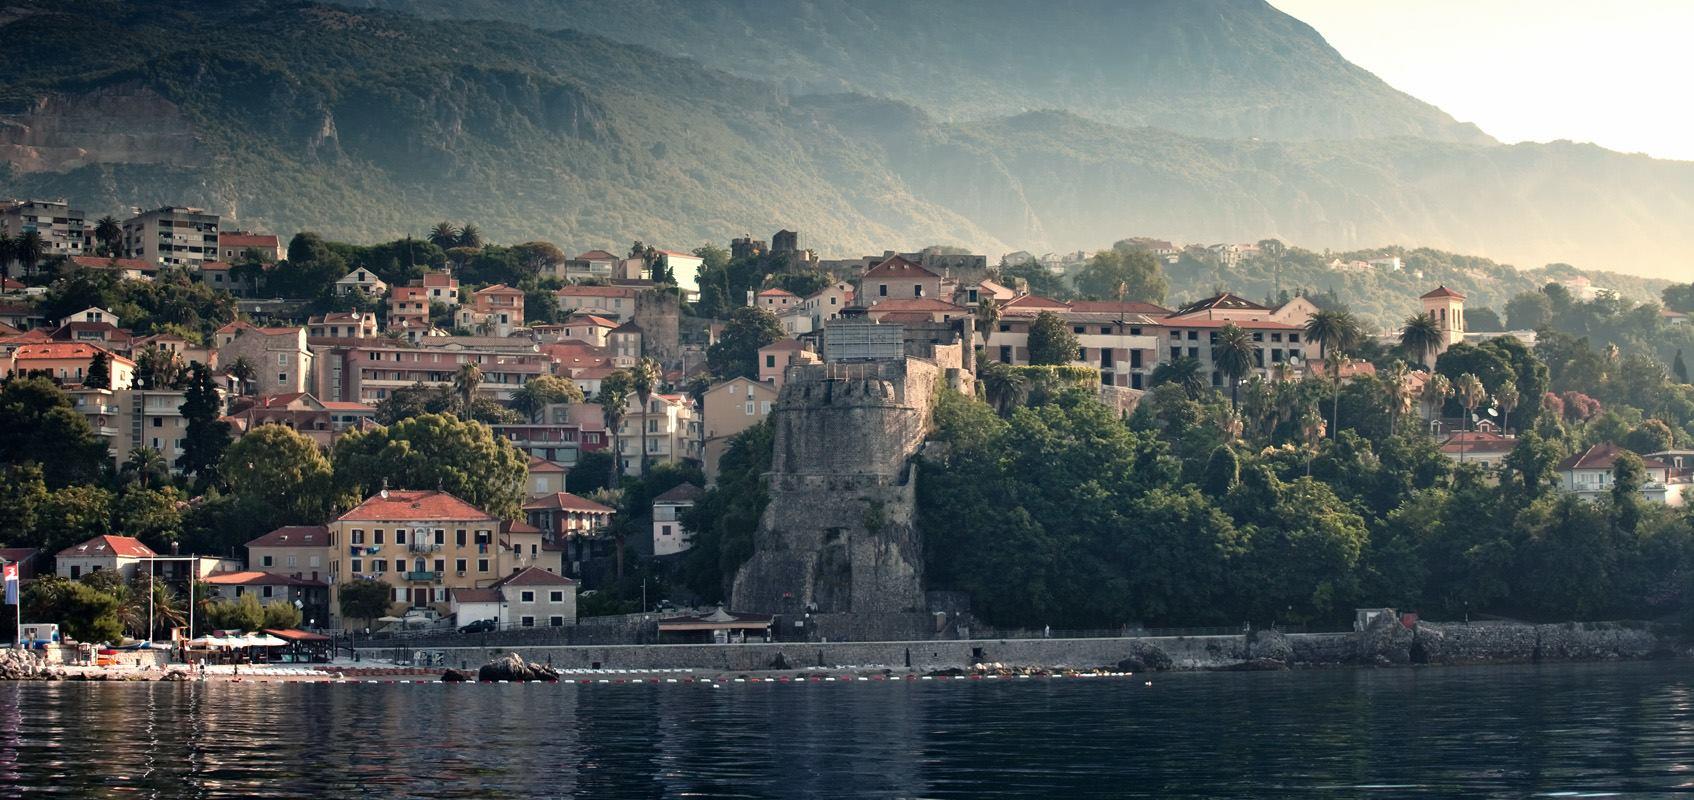 Kosmajac crosses to Montenegro